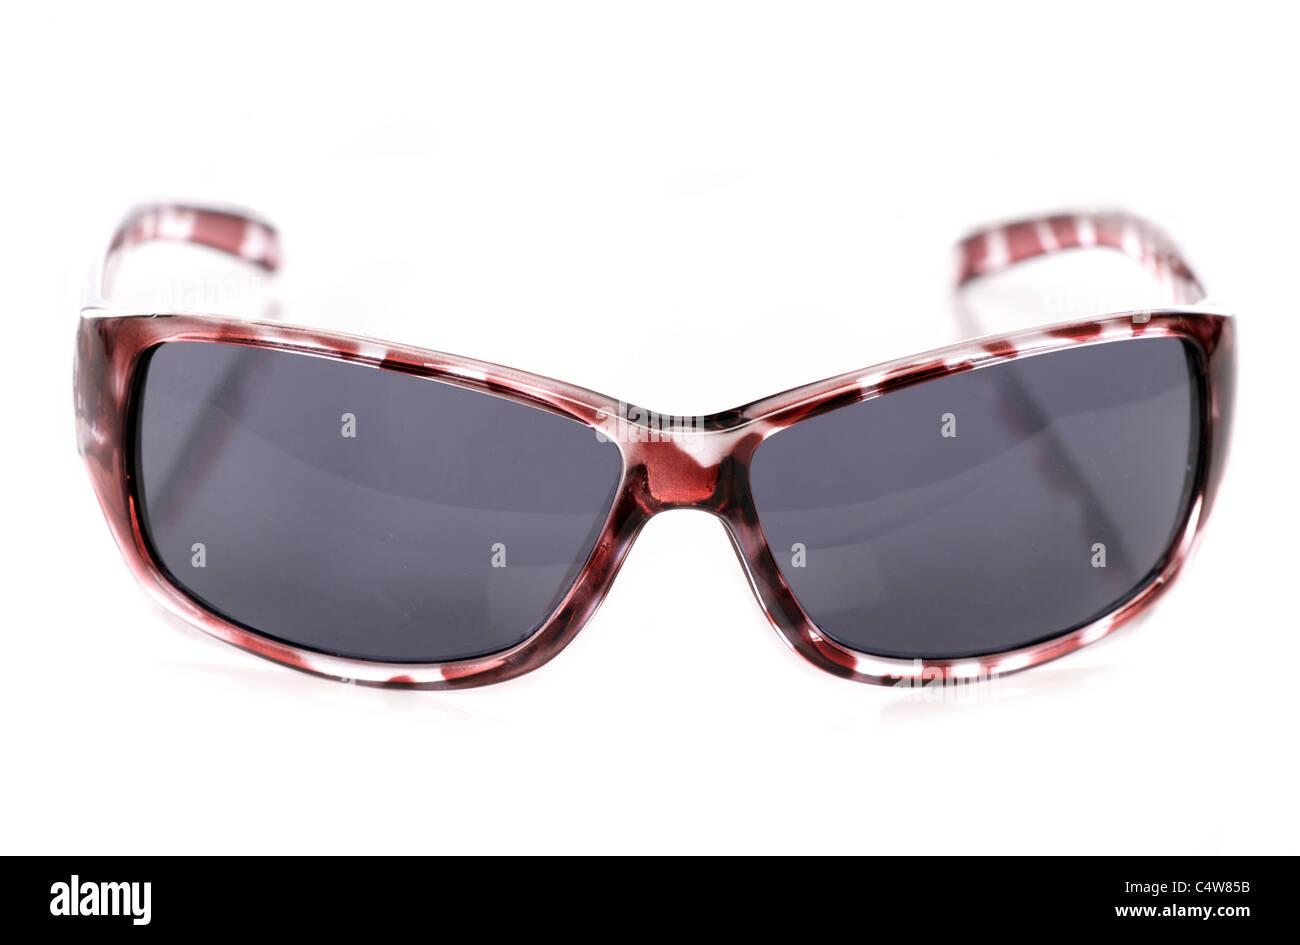 Womens gafas de sol aislado sobre fondo blanco. Foto de stock